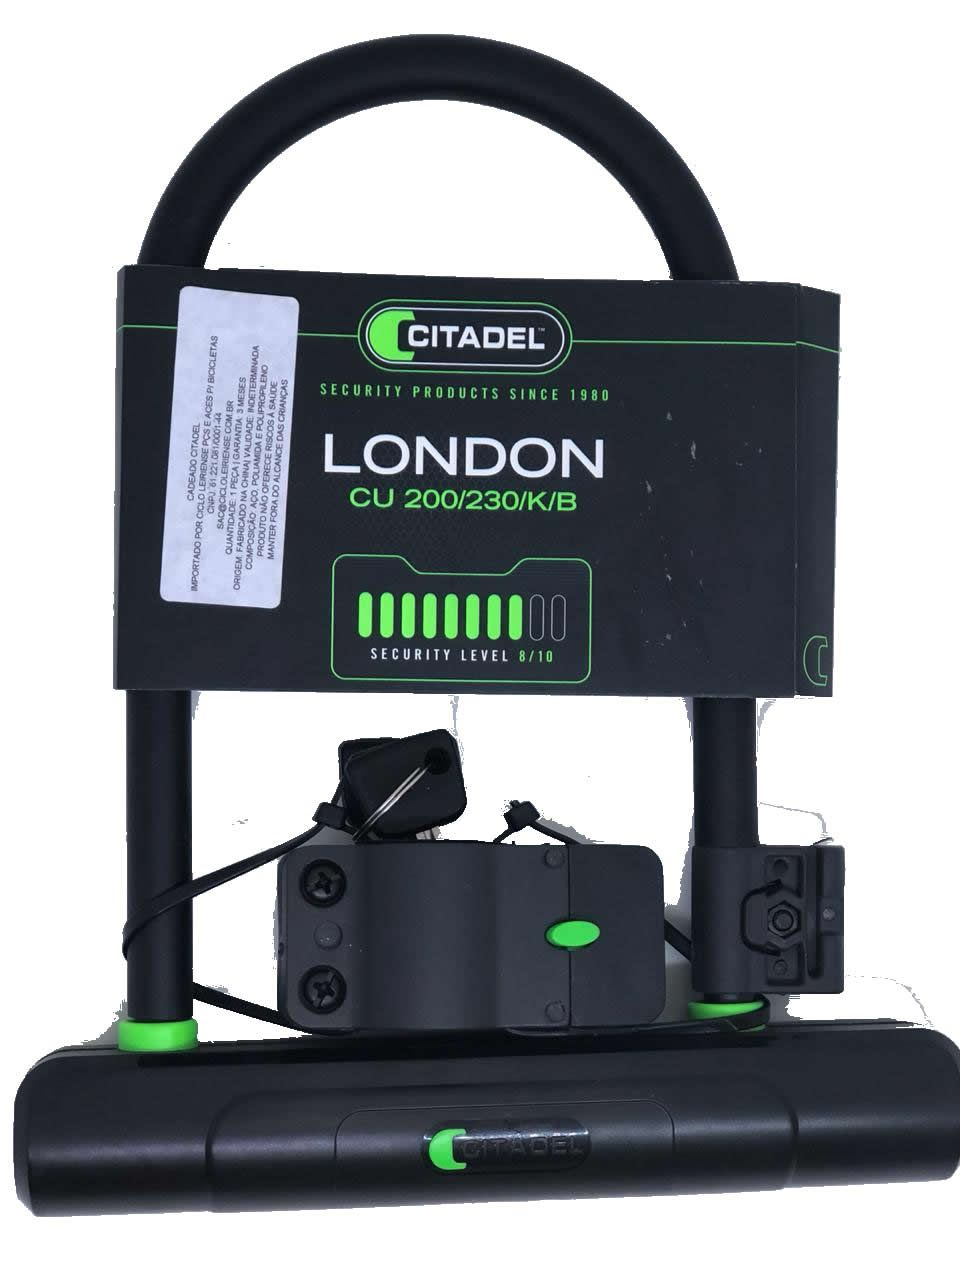 CADEADO TRAVA U-LOCK CITADEL LONDON CU 200/230/K/B CHAVE